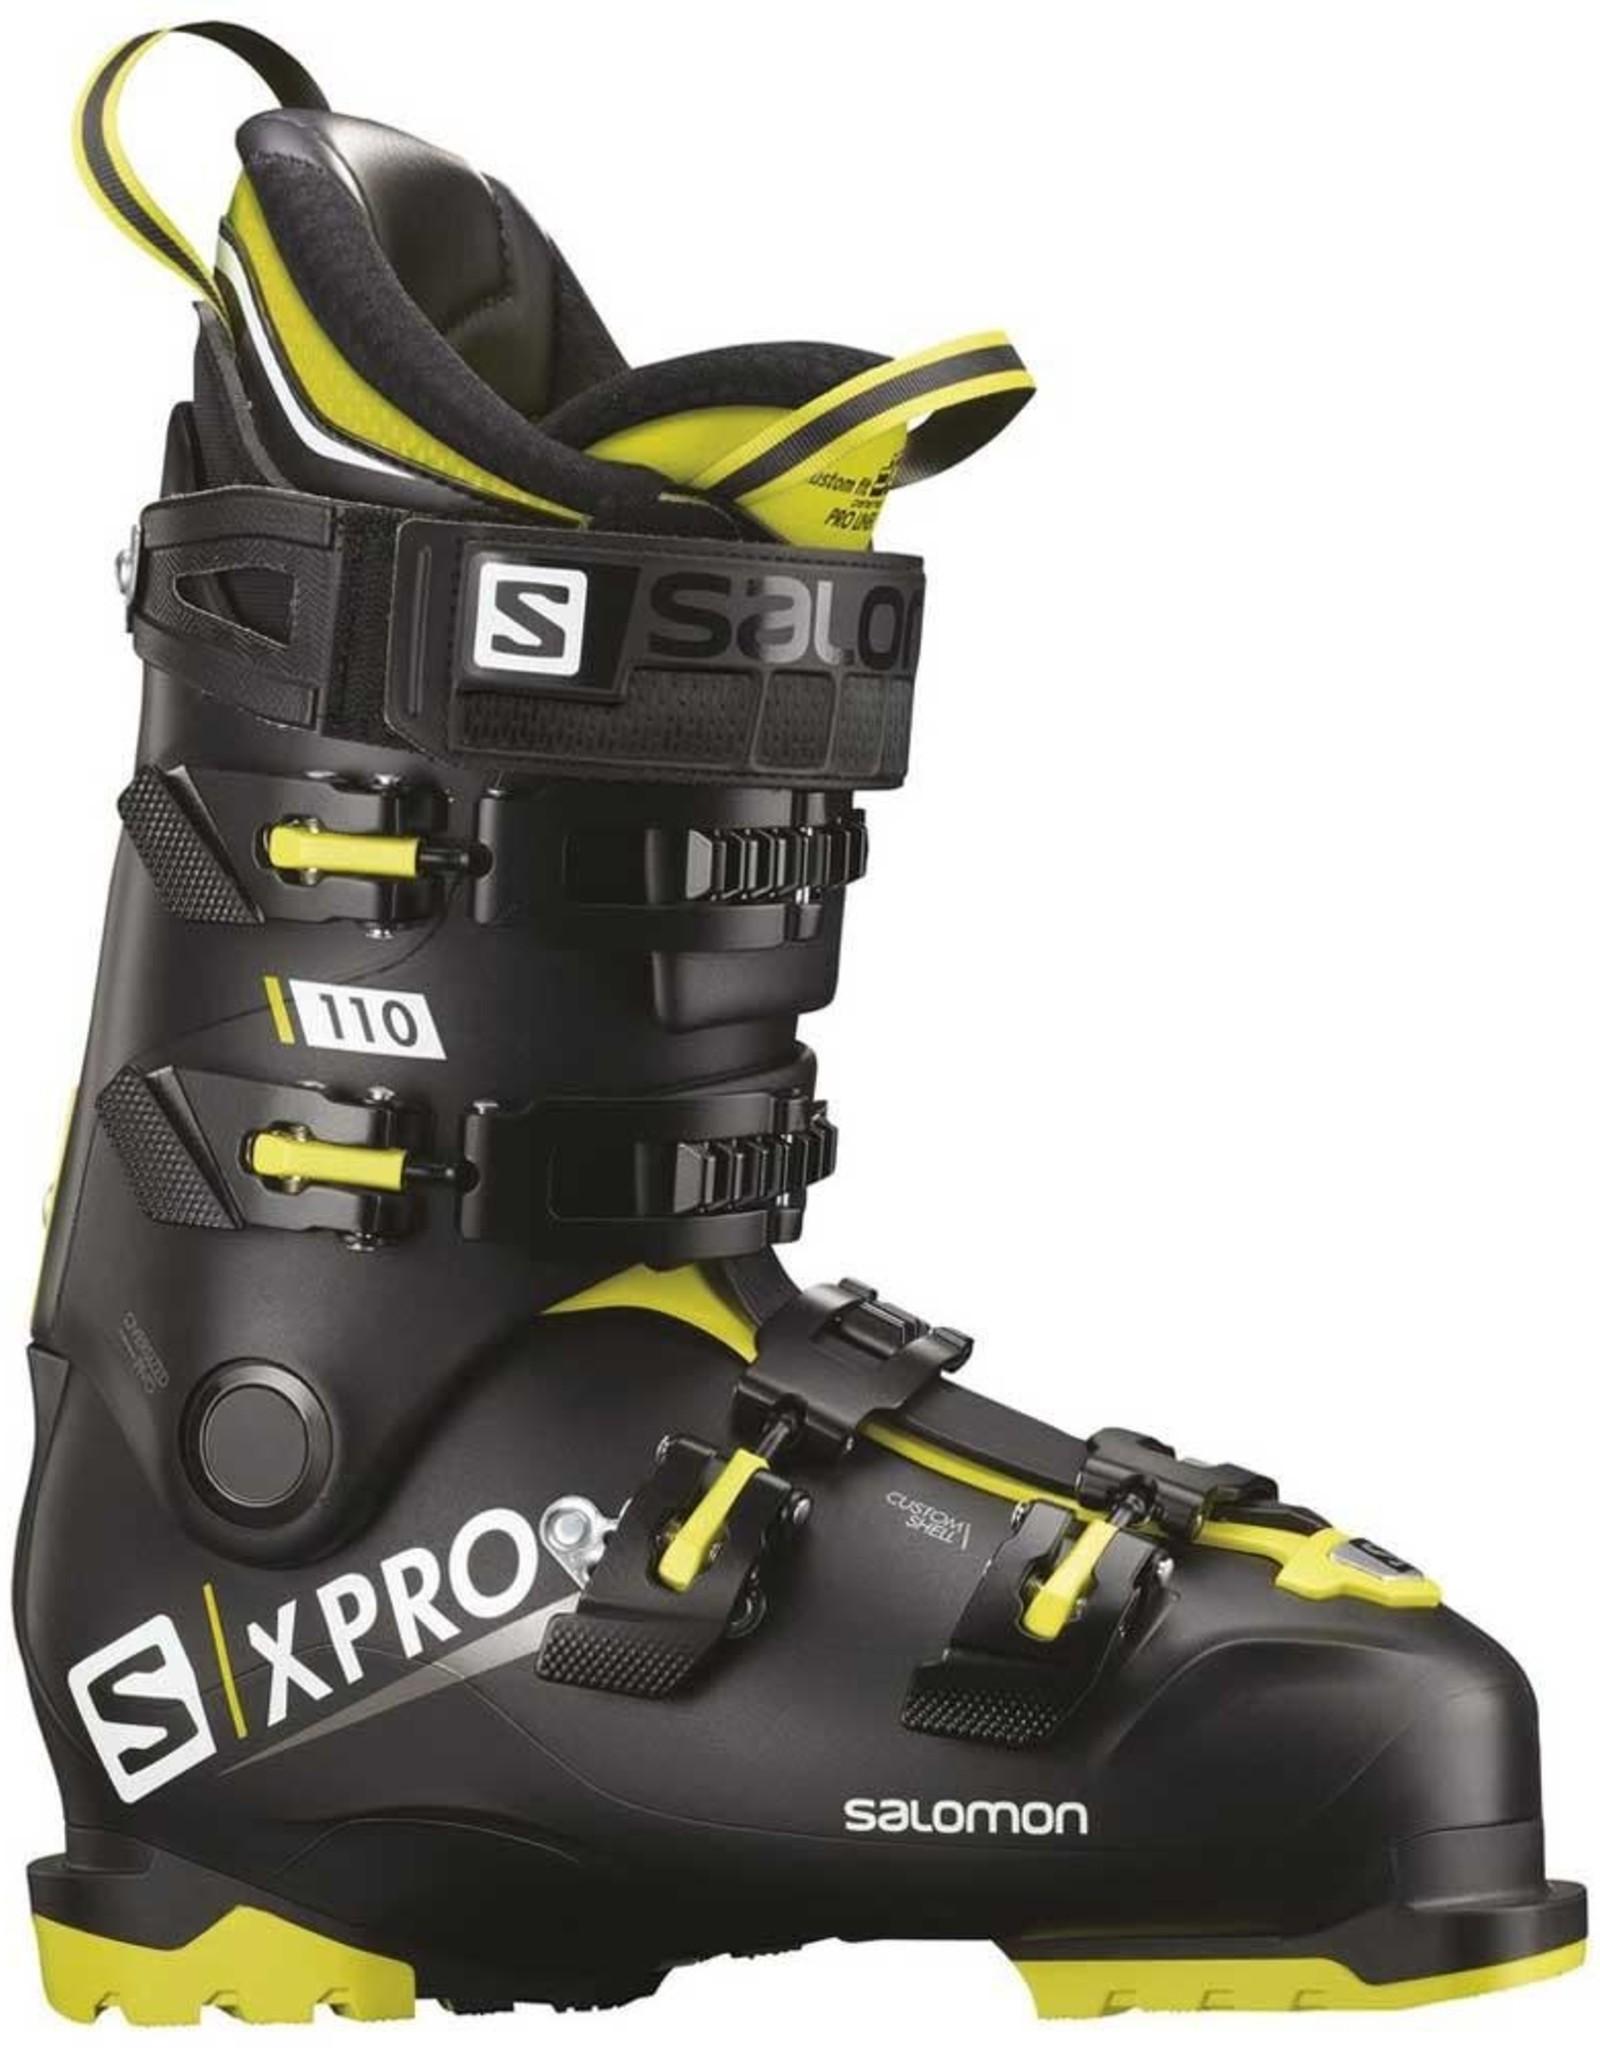 Salomon SALOMON Ski Boots X PRO 110 (18/19)